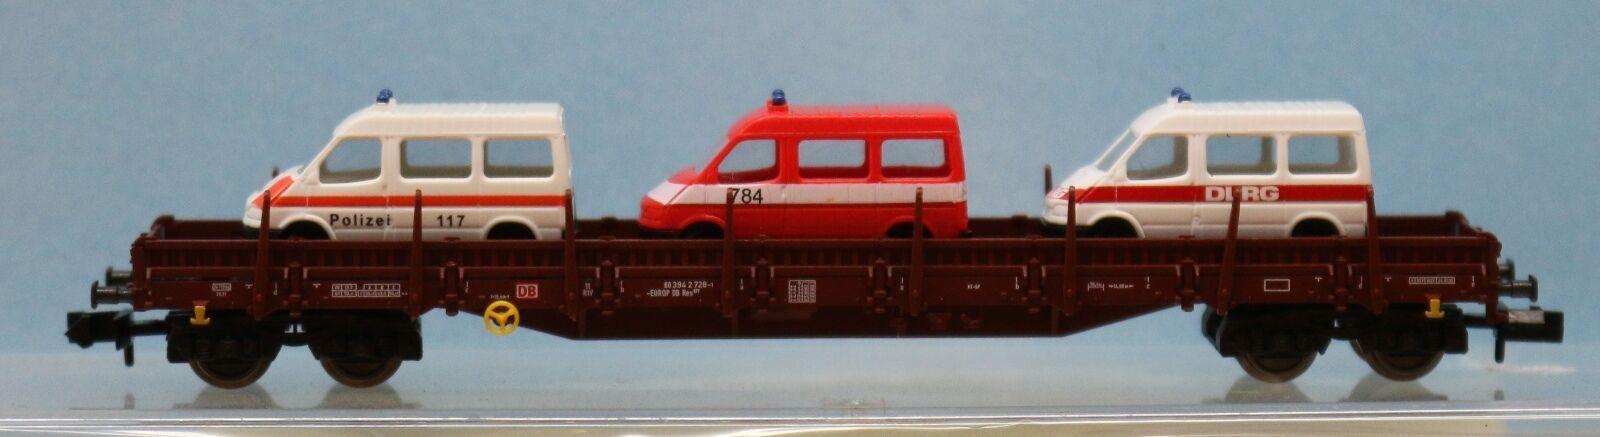 Fleischmann 828901 .1, Traccia N, DB AG Rungenwagen carico con 3 FORD TRANSIT